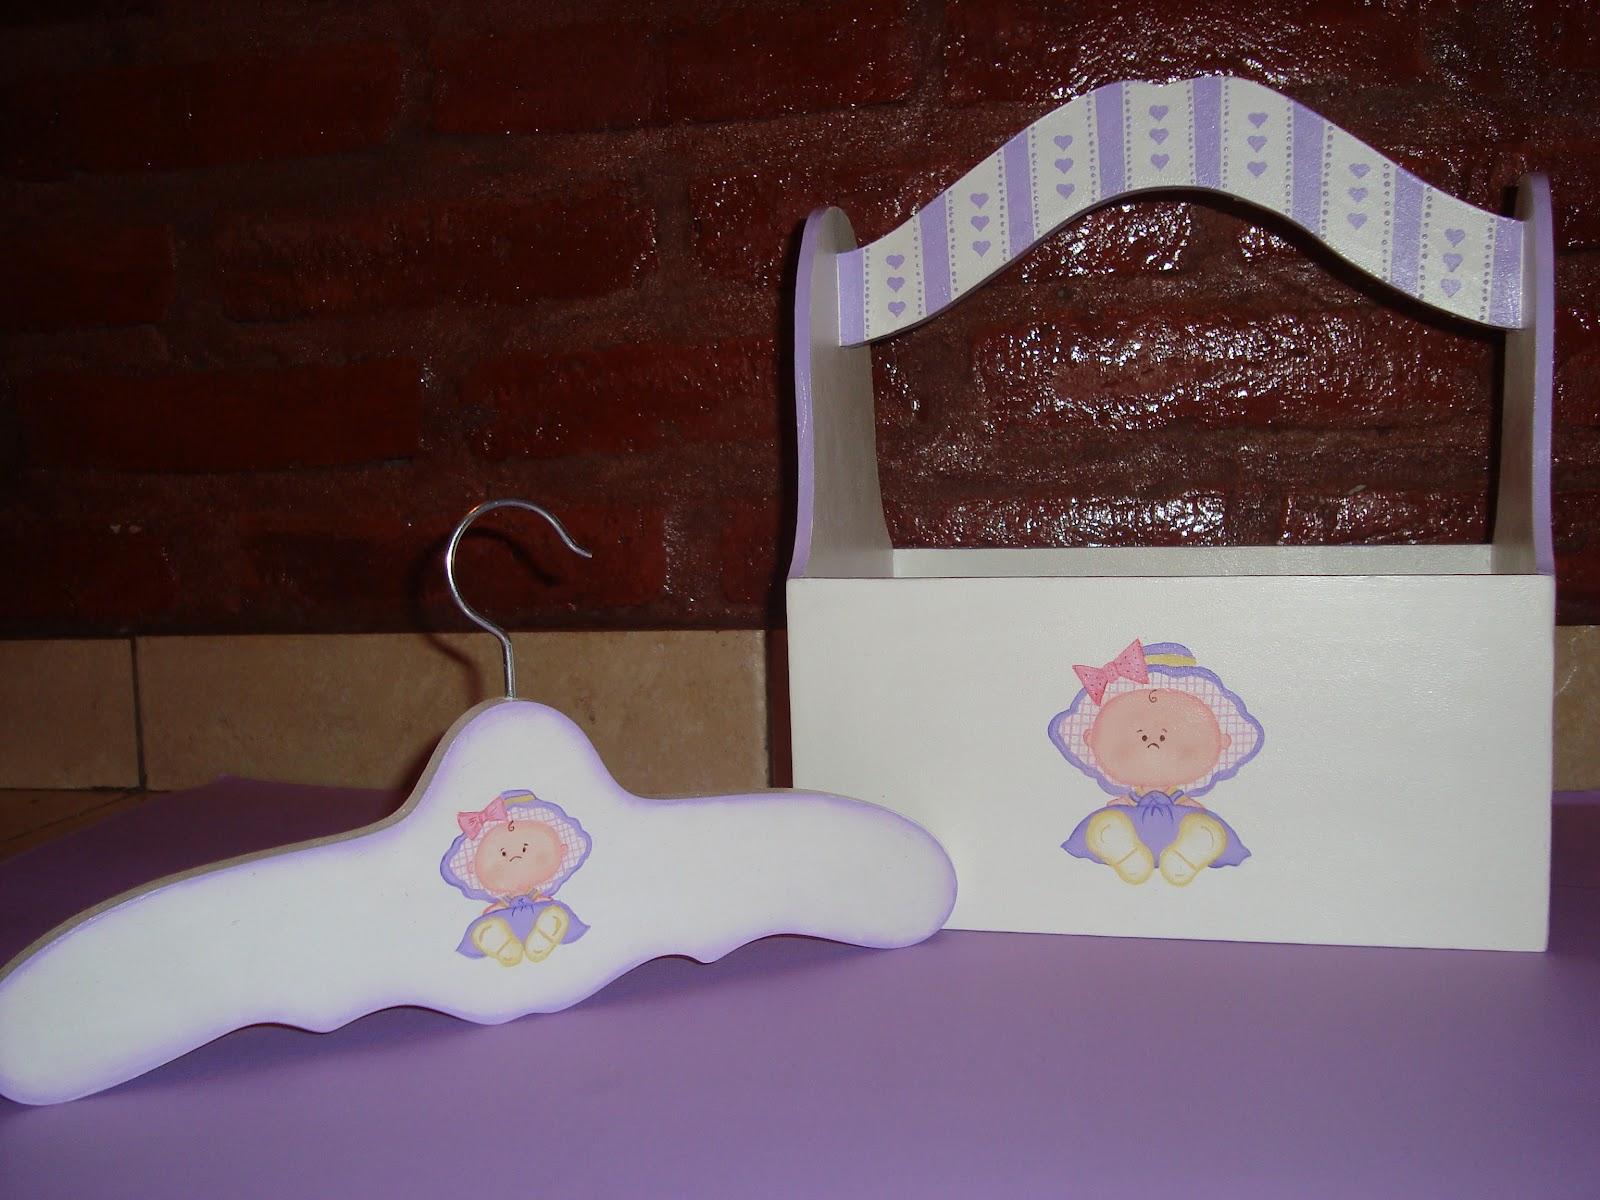 Mis artesanias del alma set para bebes - Perchas madera bebe ...